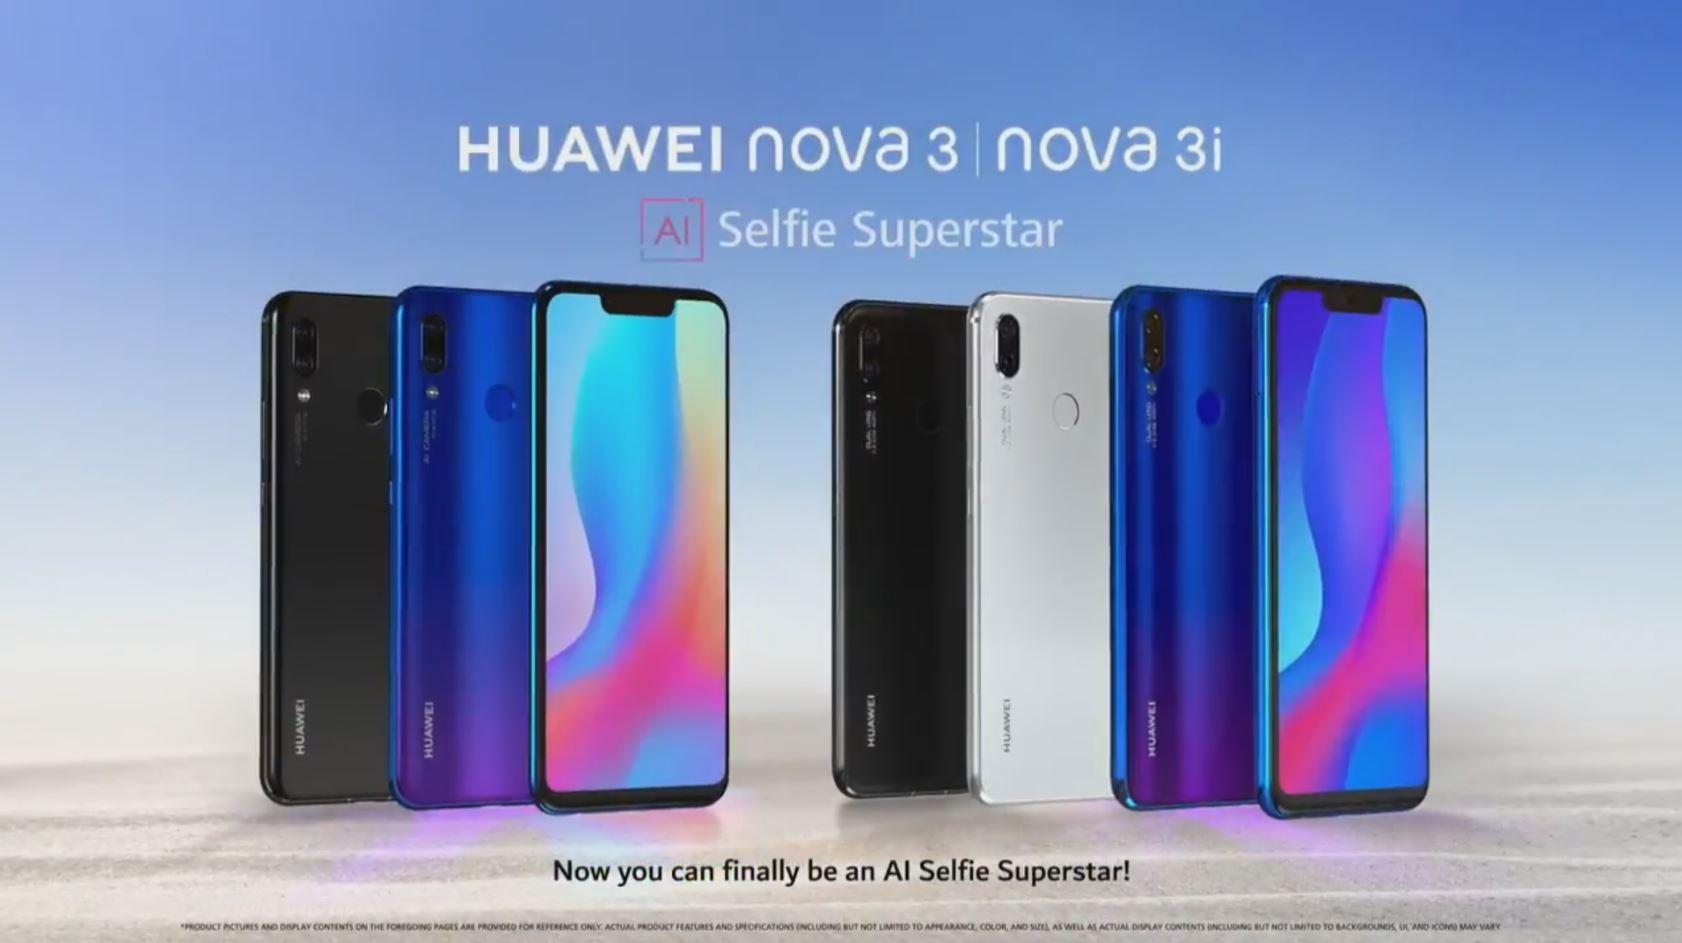 Huawei Nova 3i is launching globally alongside Nova 3, Kirin